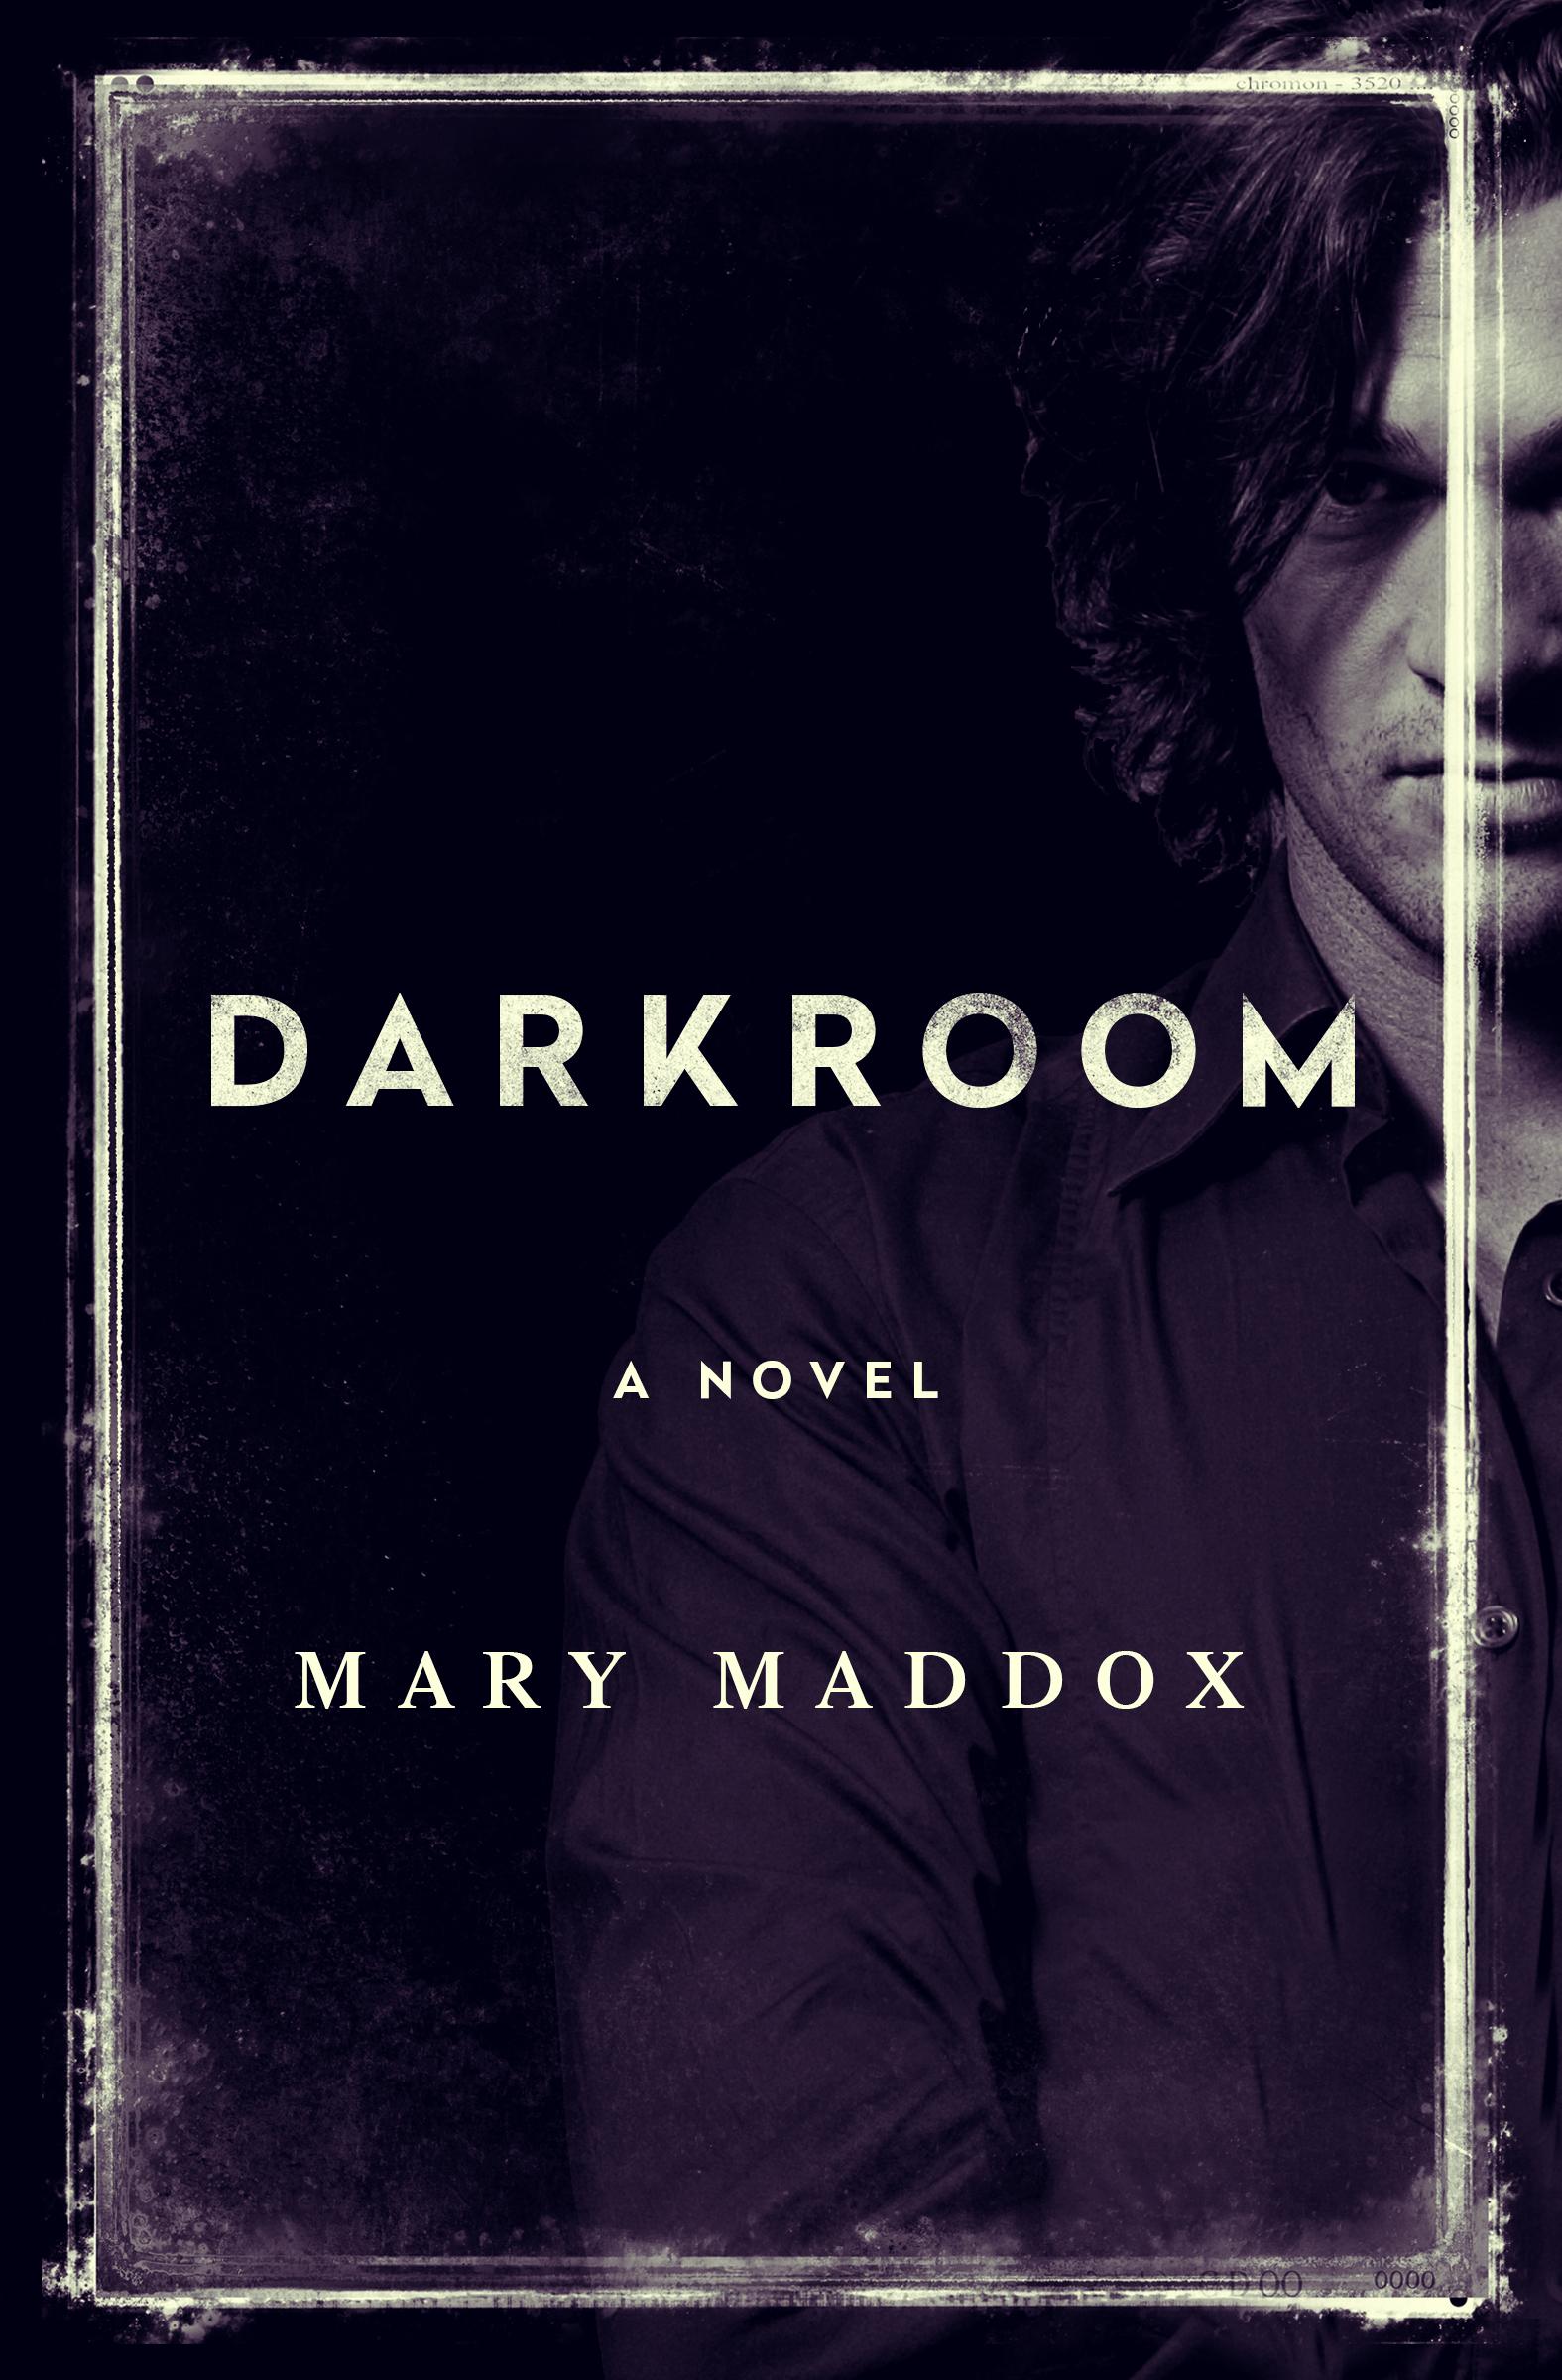 Darkroom by Mary Maddox